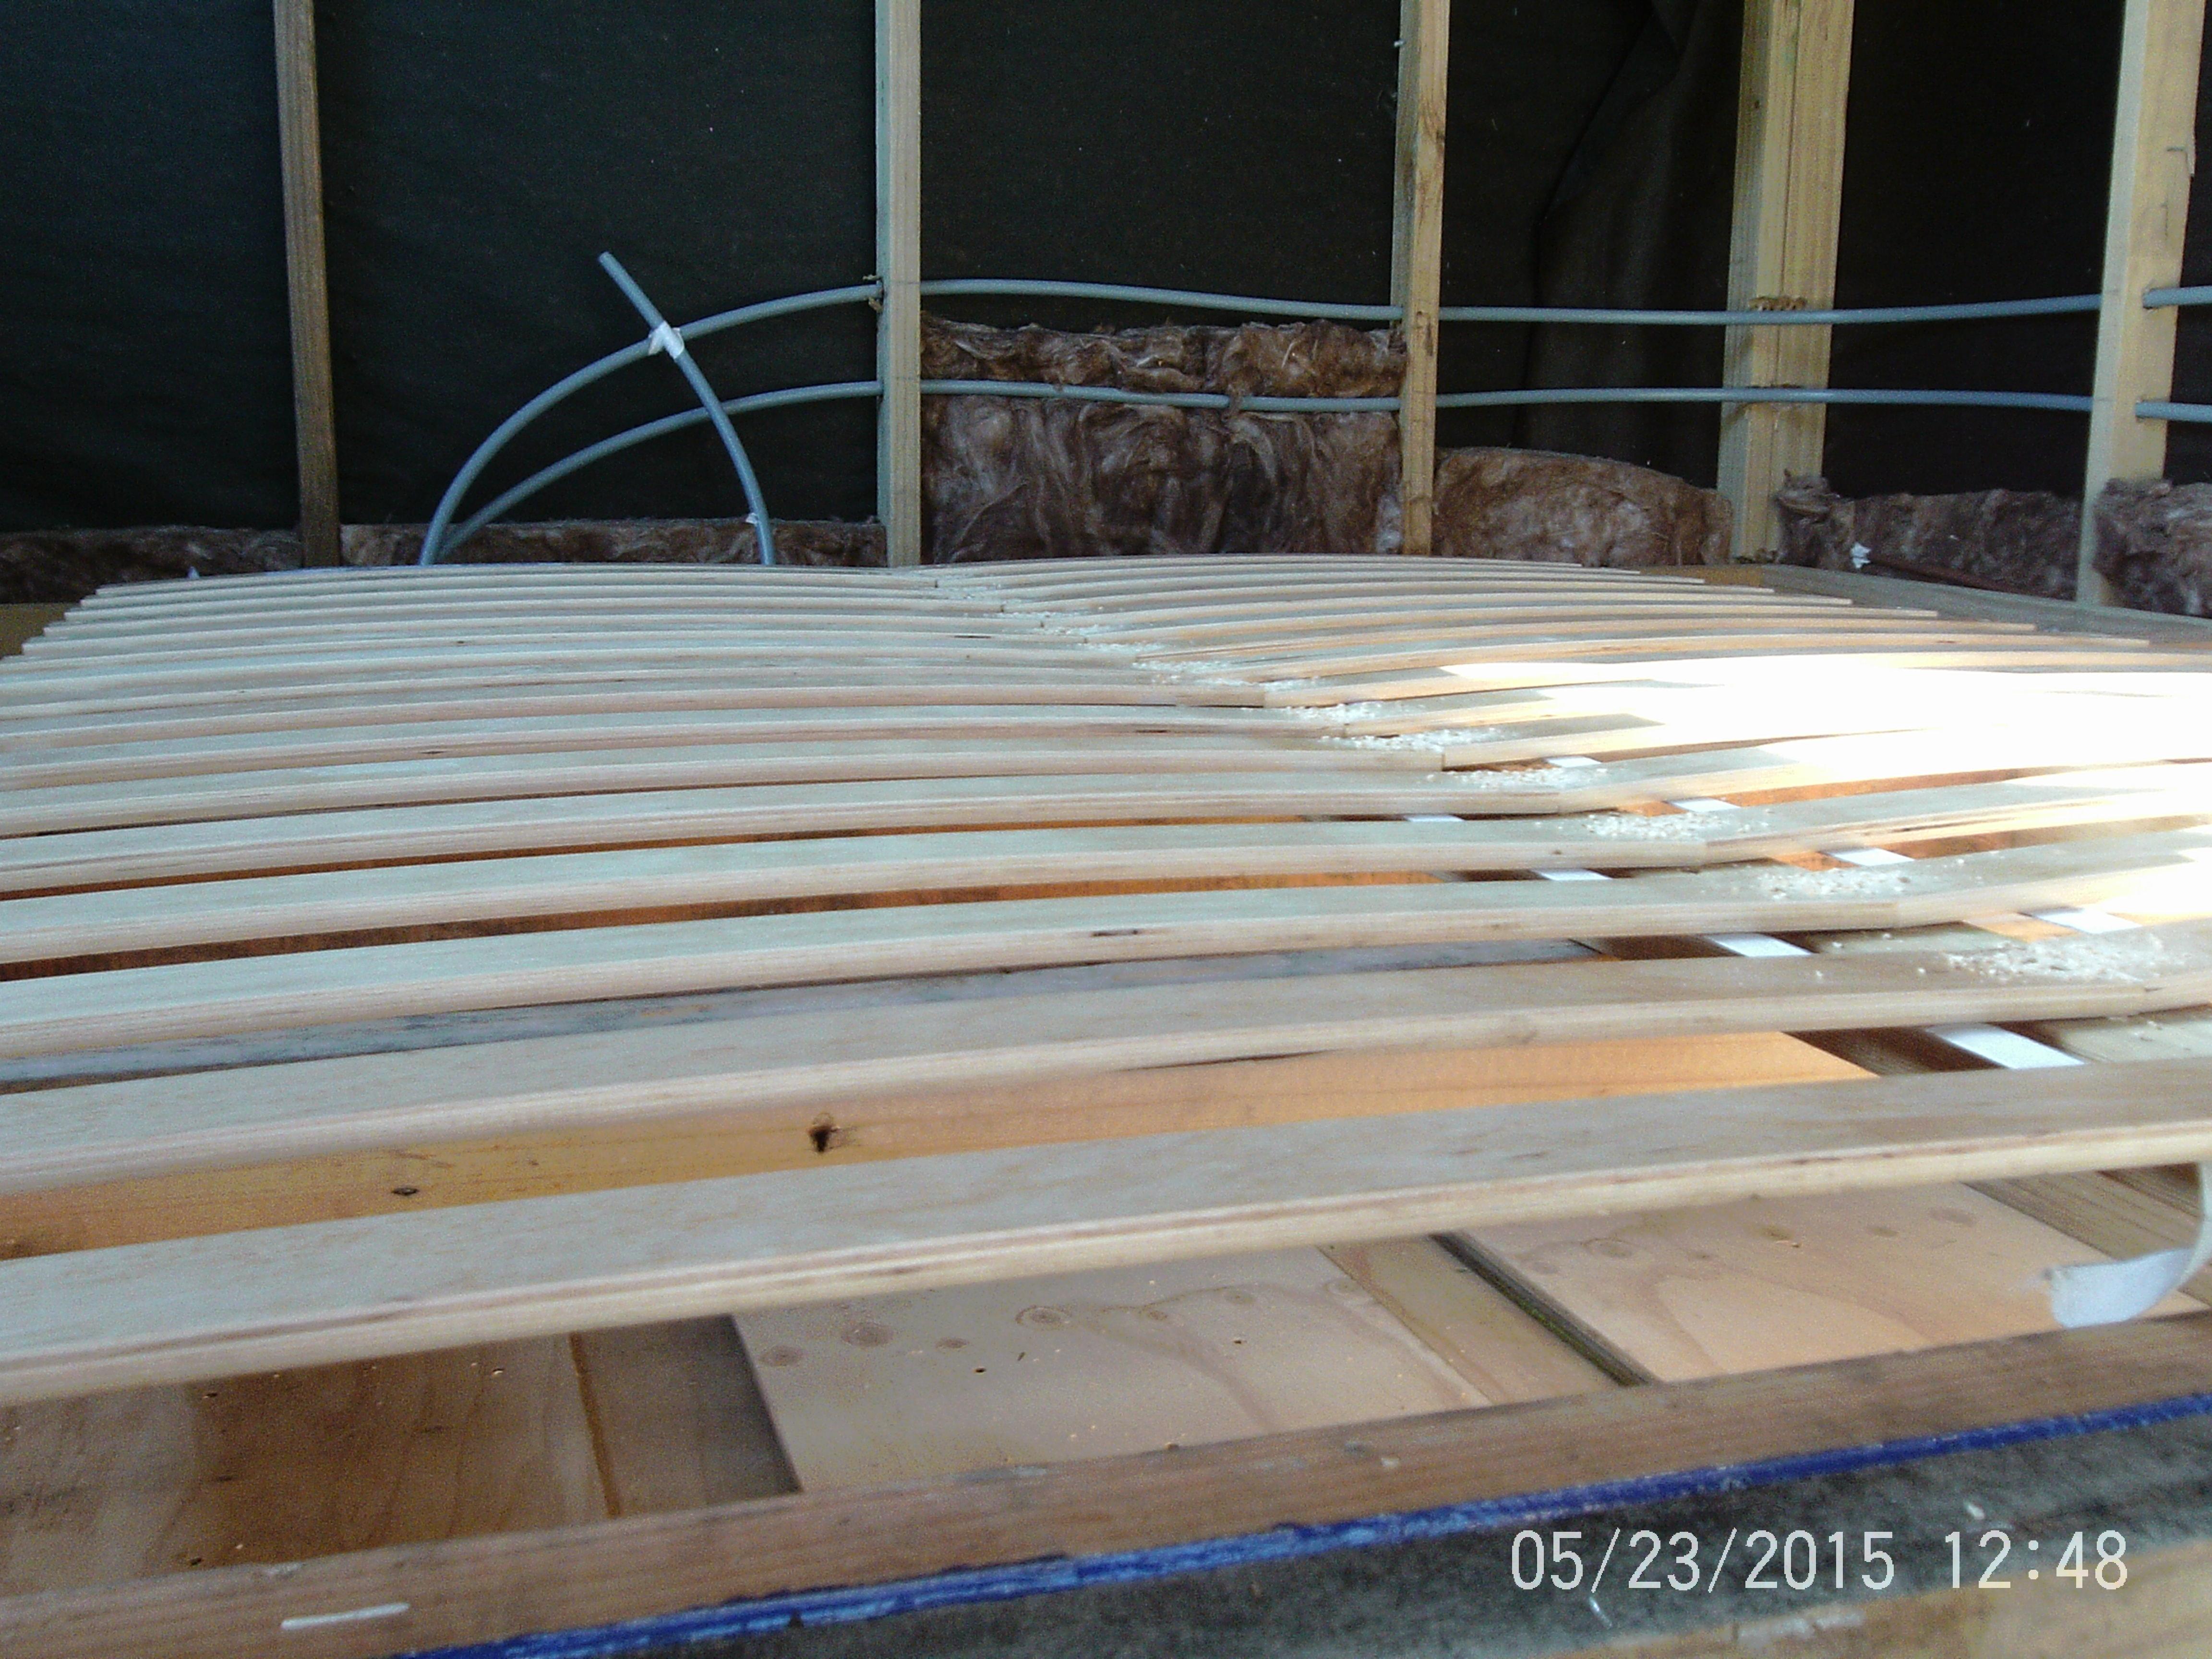 Underfloor Bed Storage – South Island Tiny House Chch NZ